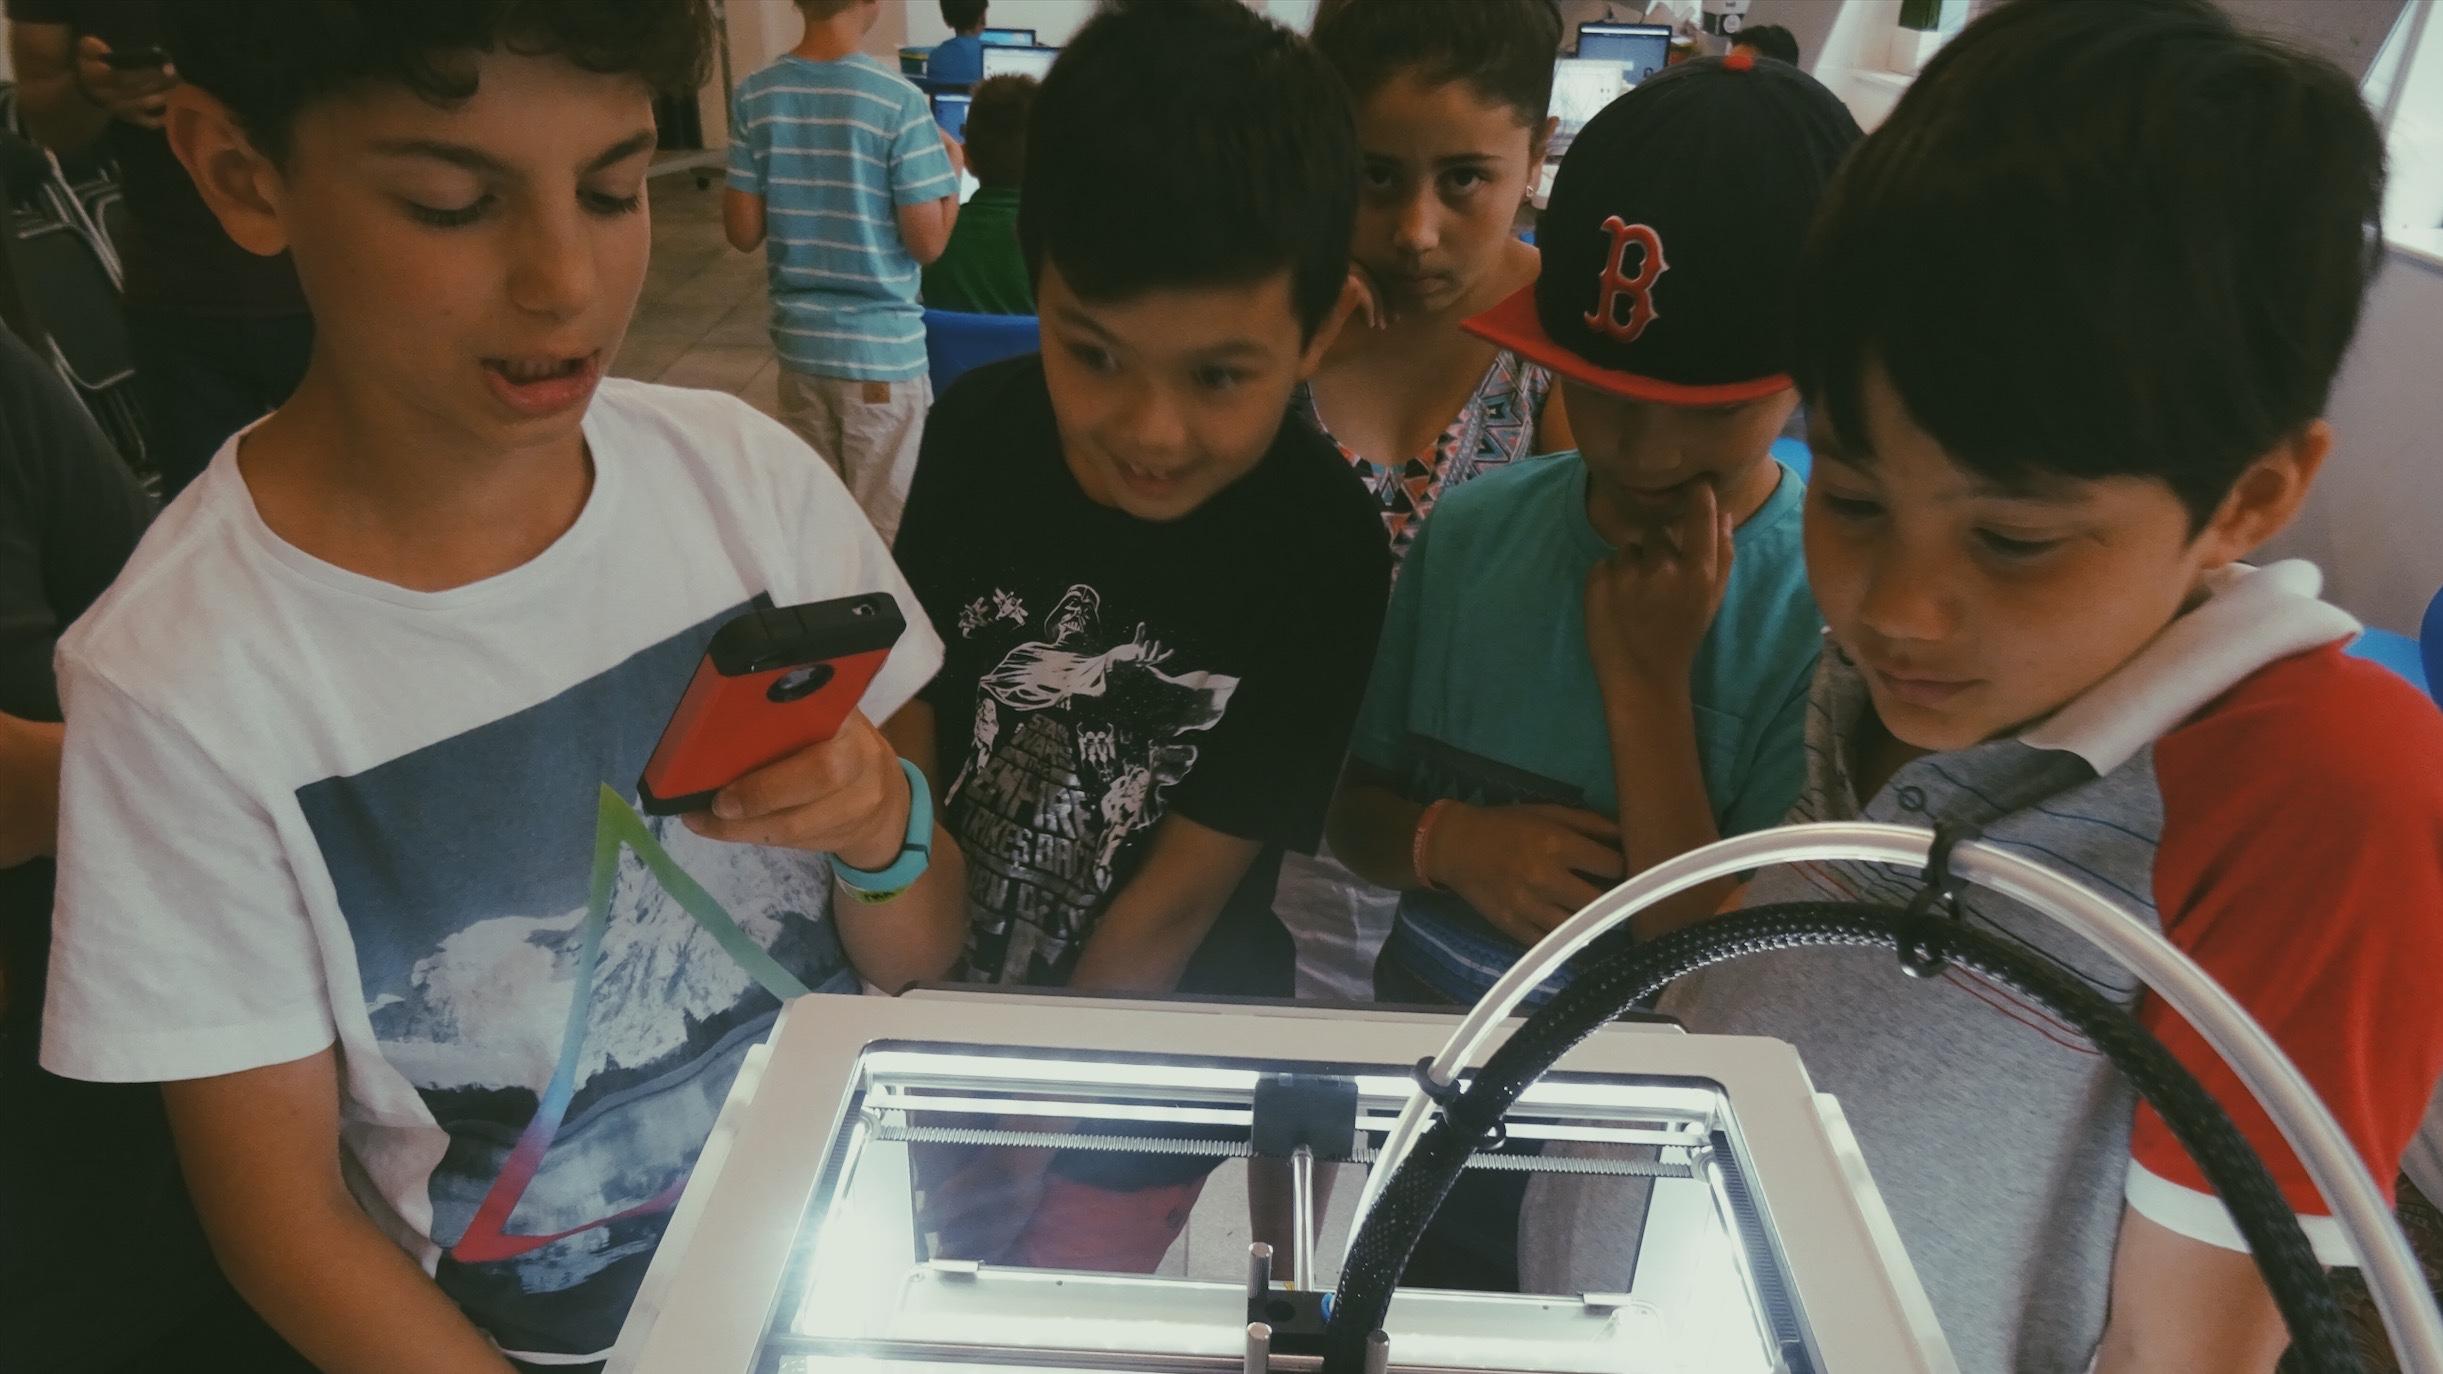 Lemonade Stand Kids AR: kids looking at a 3D printer